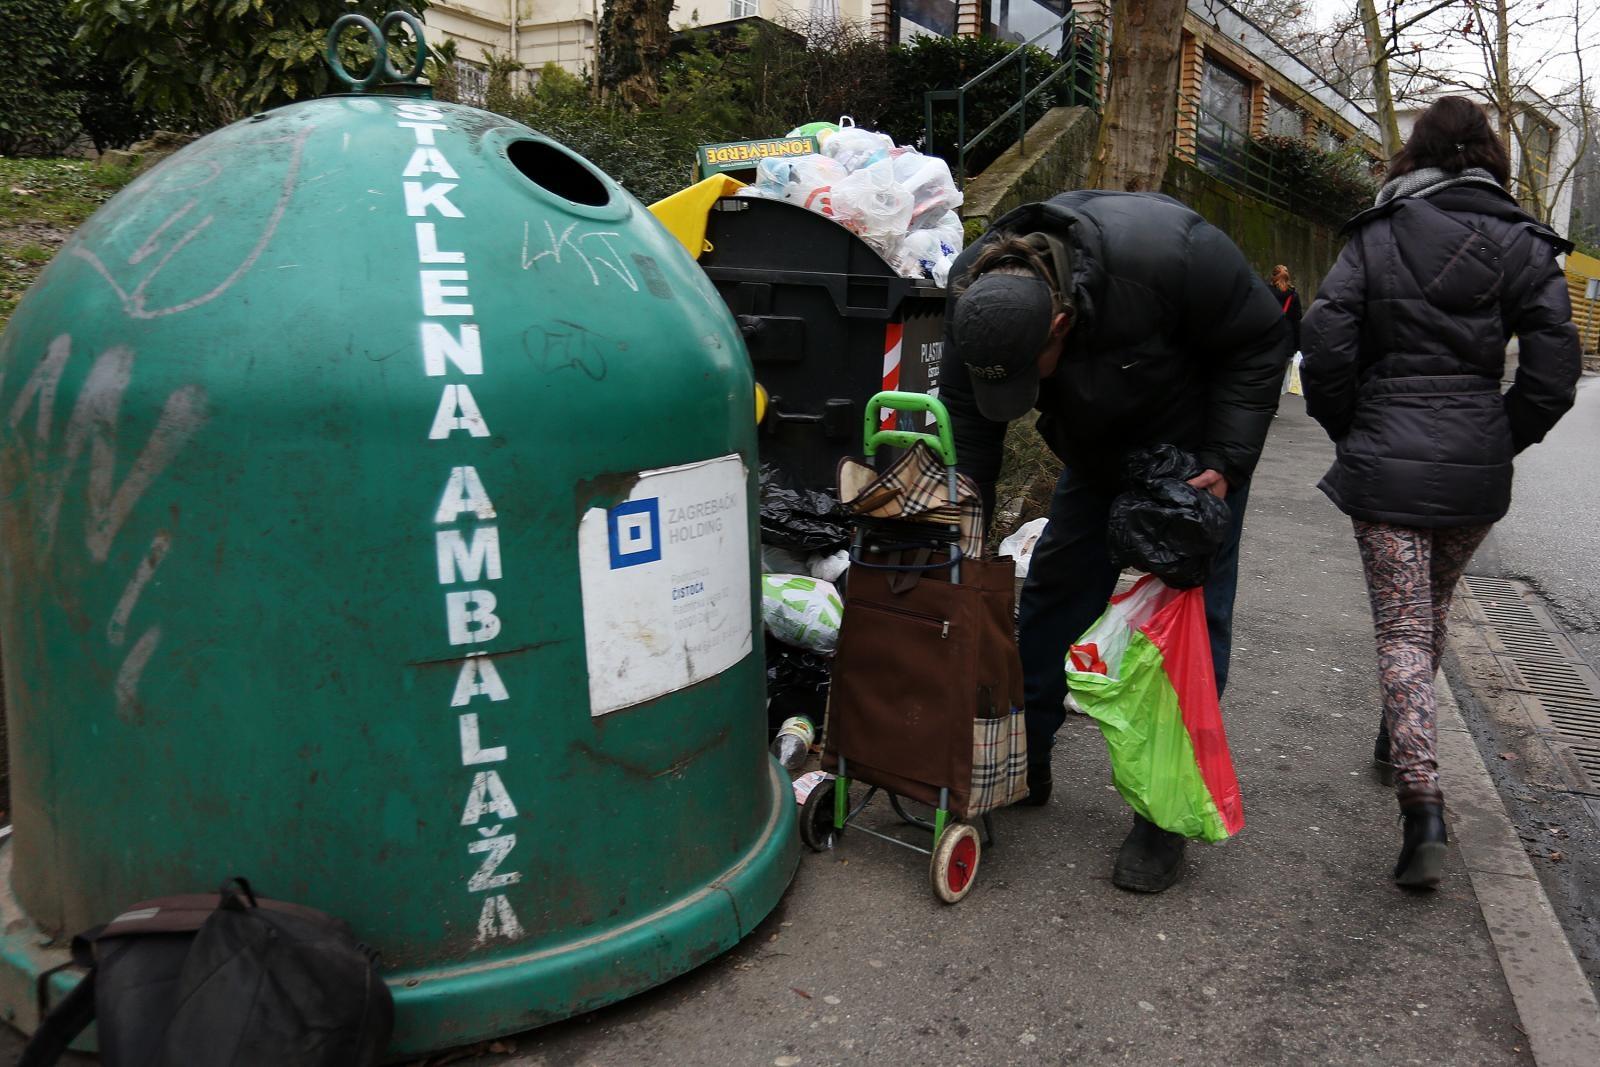 Zagrebački zastupnici upozorili na problem s otpadom